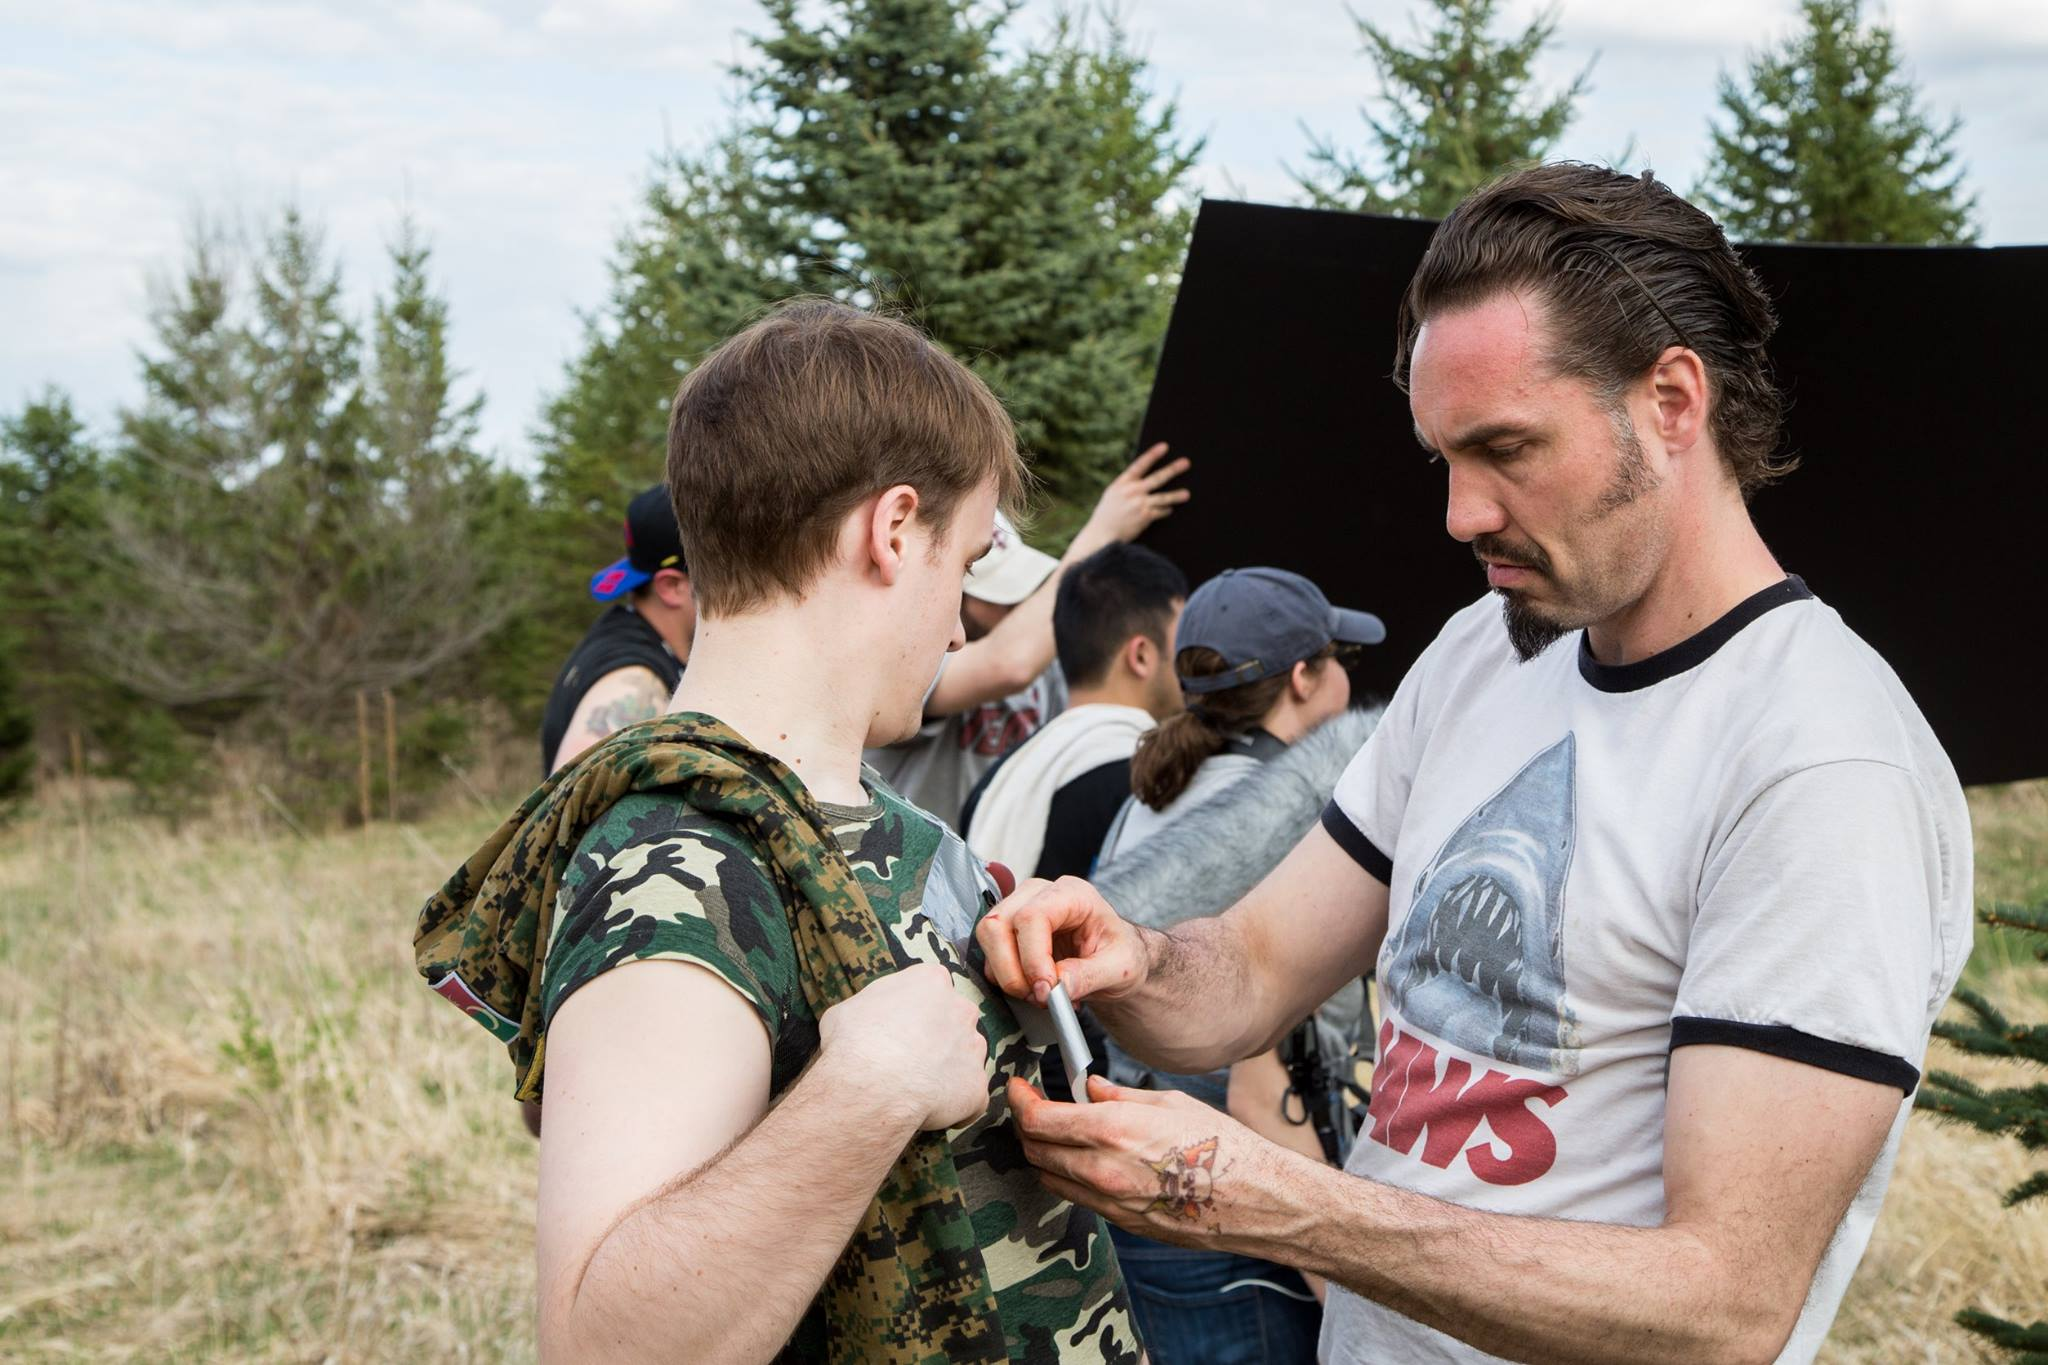 Ryan Schaddelee, Special Effects Coordinator